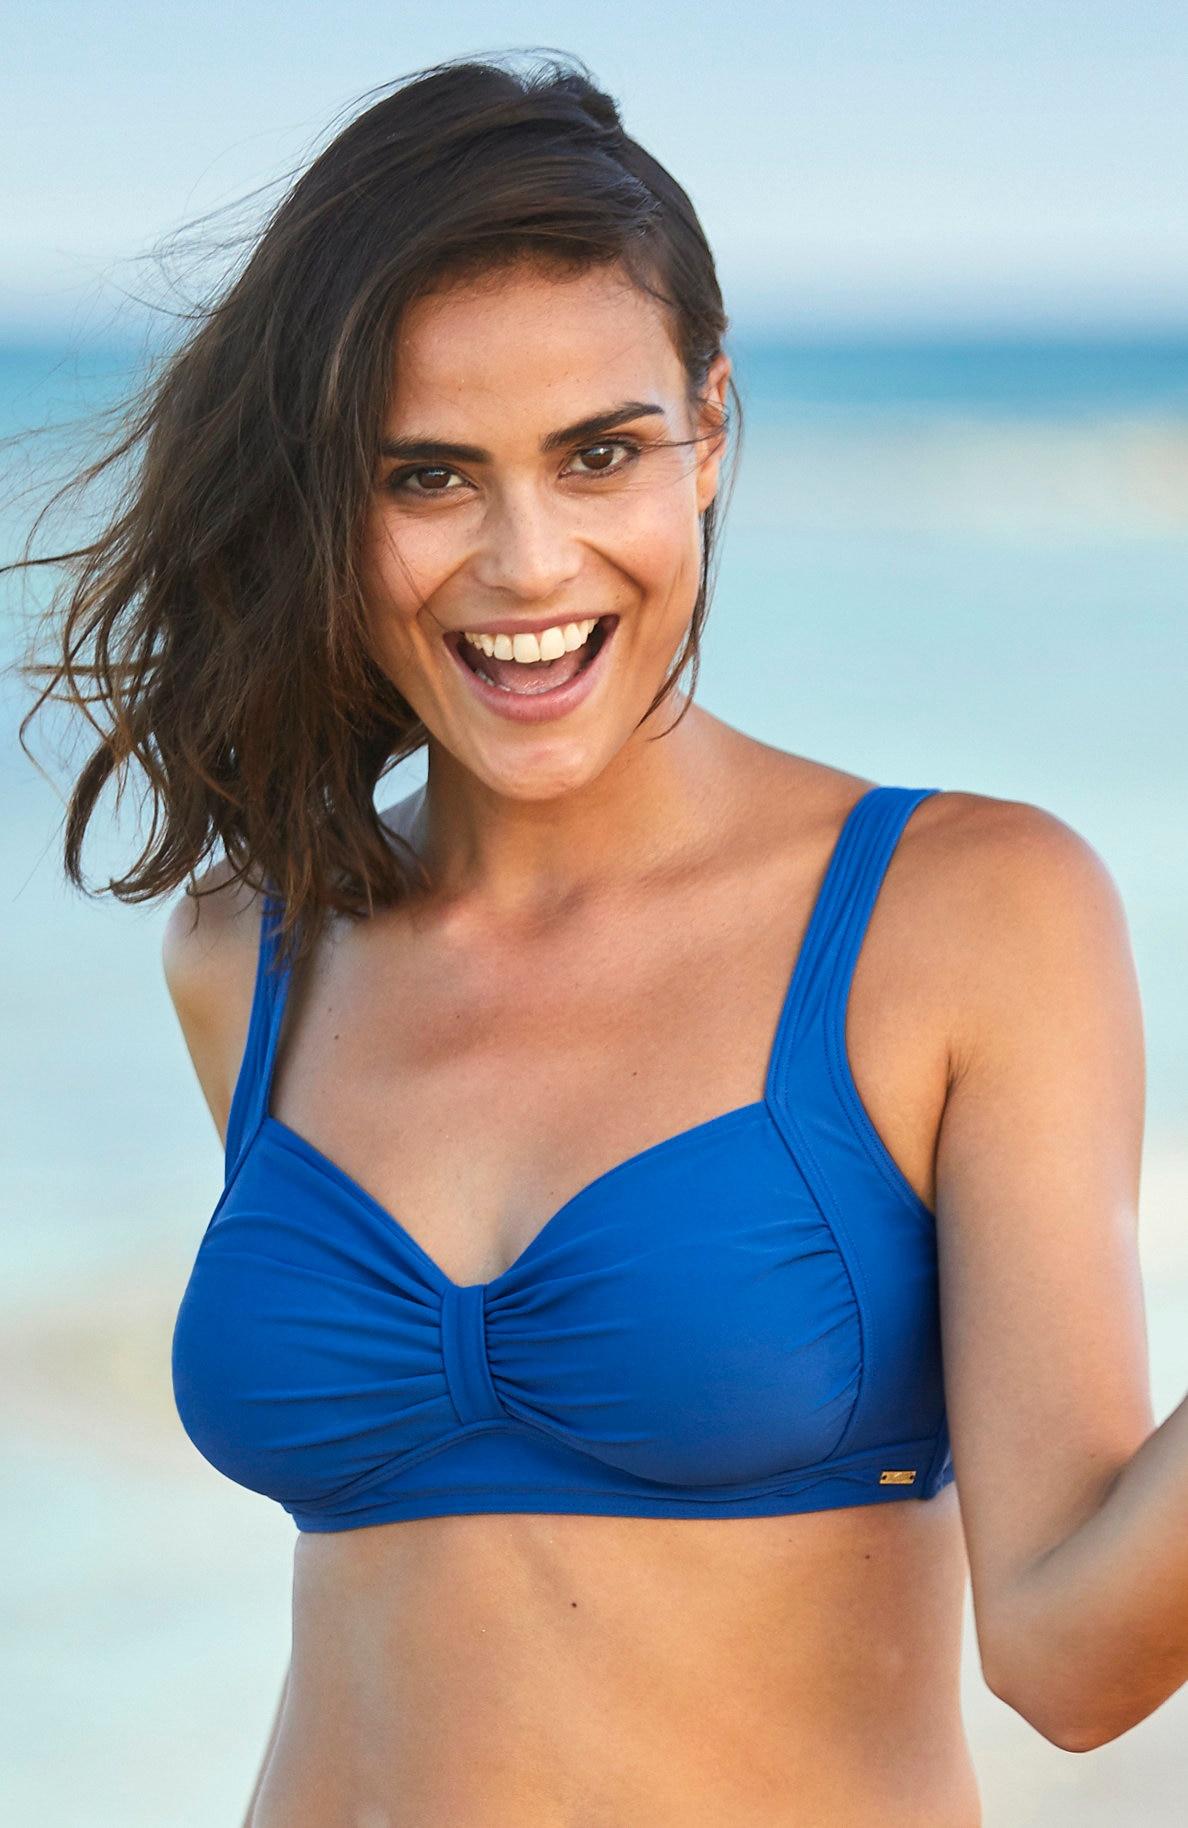 Blå bikini-bh uten bøyle